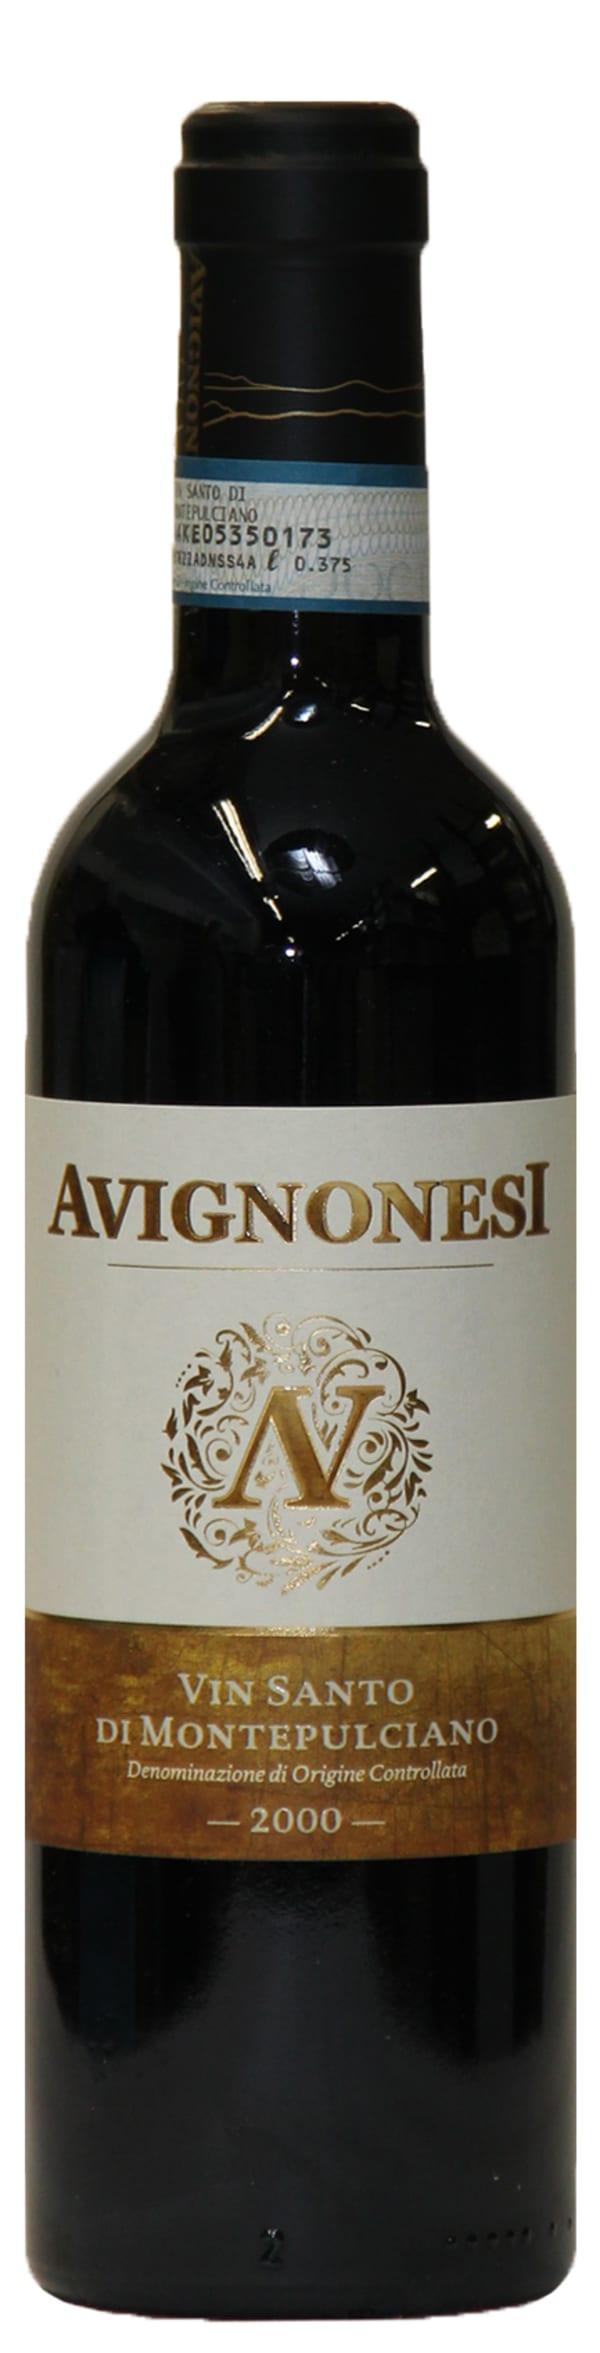 Avignonesi Vin Santo di Montepulciano 2000